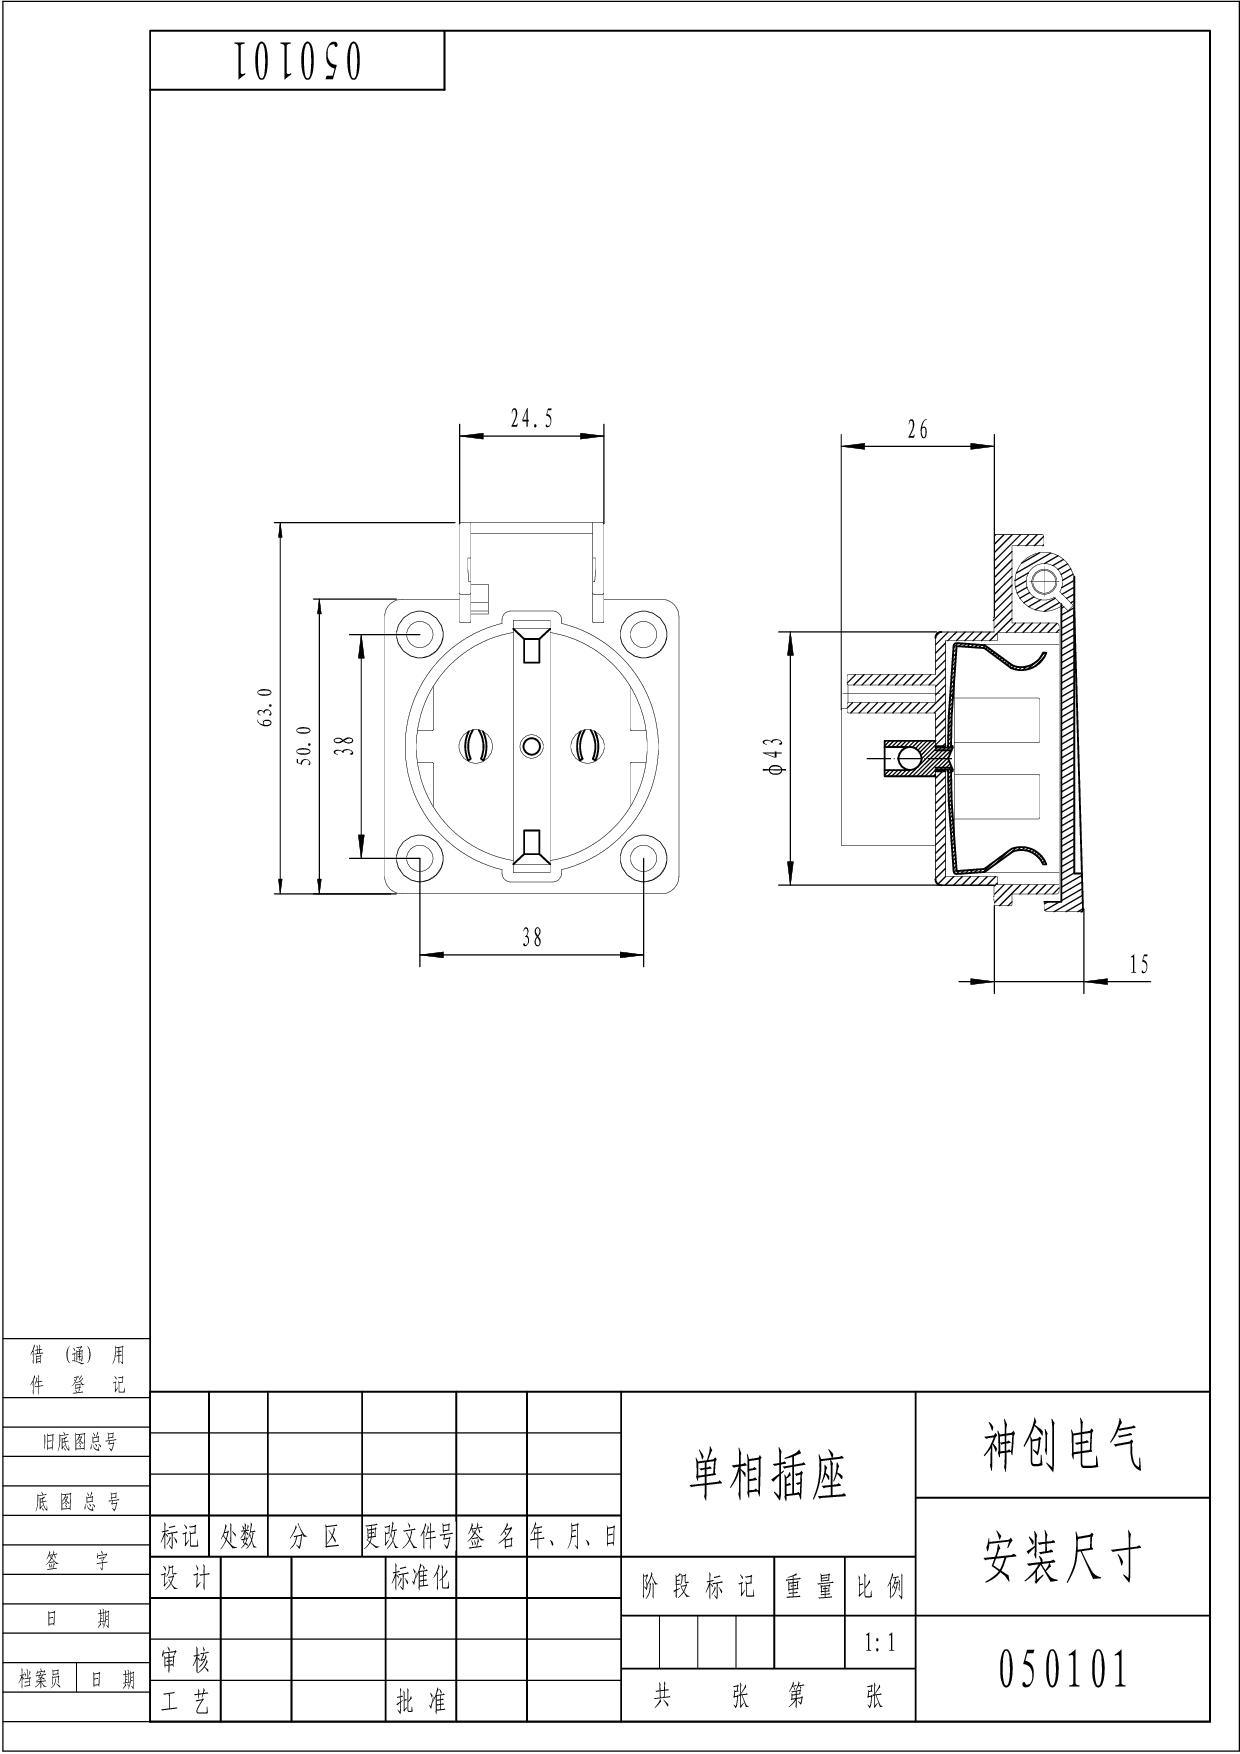 Wiring Diagram For European Receptacles Building A Germany Diagrams Ce Tuv 16a Ip44 Waterproof Euro German Schuko Electrical Door Socket